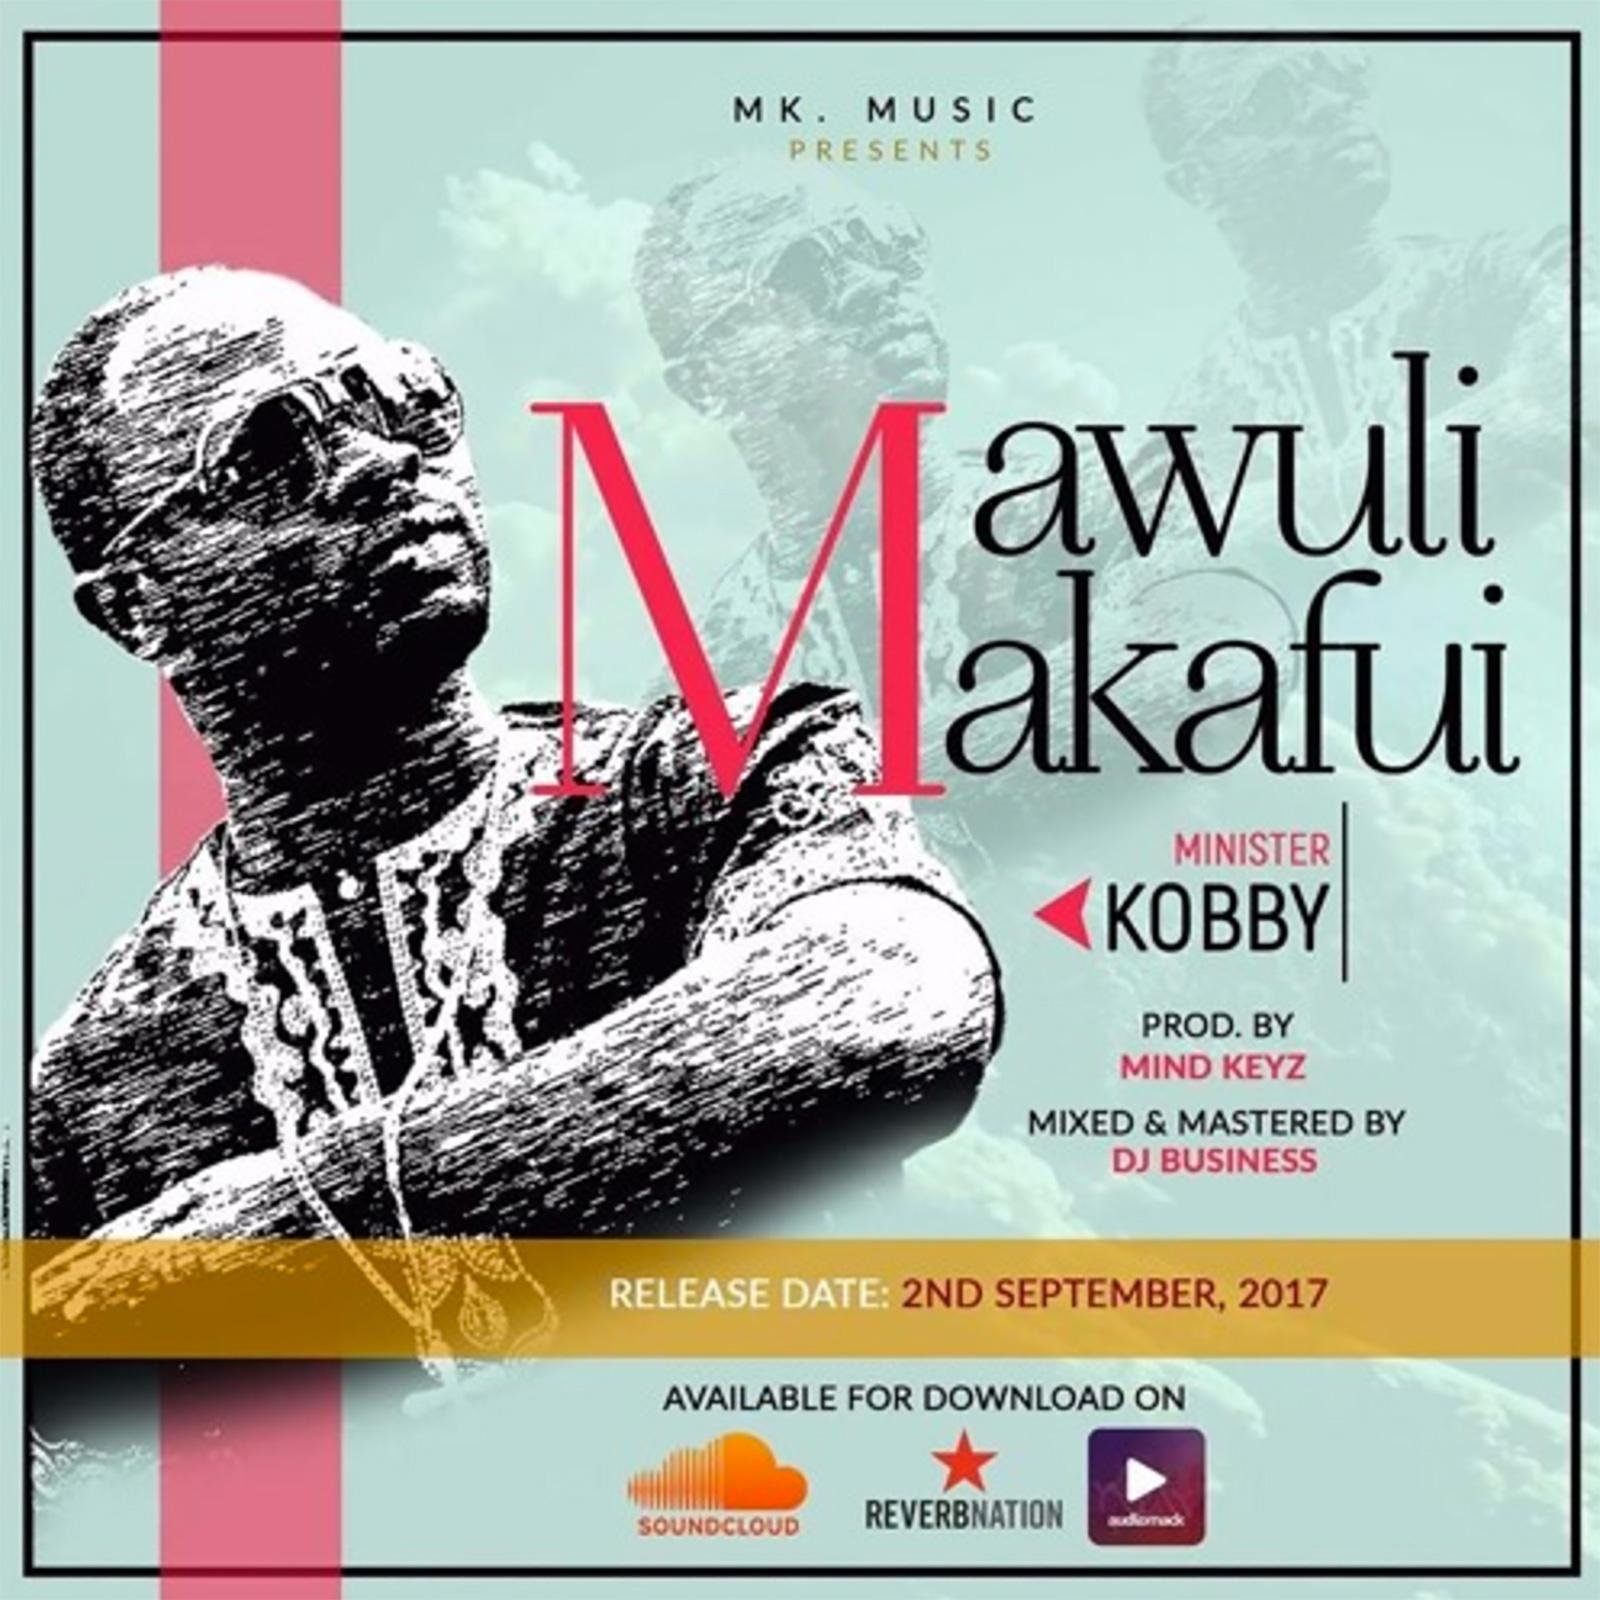 Mawuli Makafui by Minister Kobby